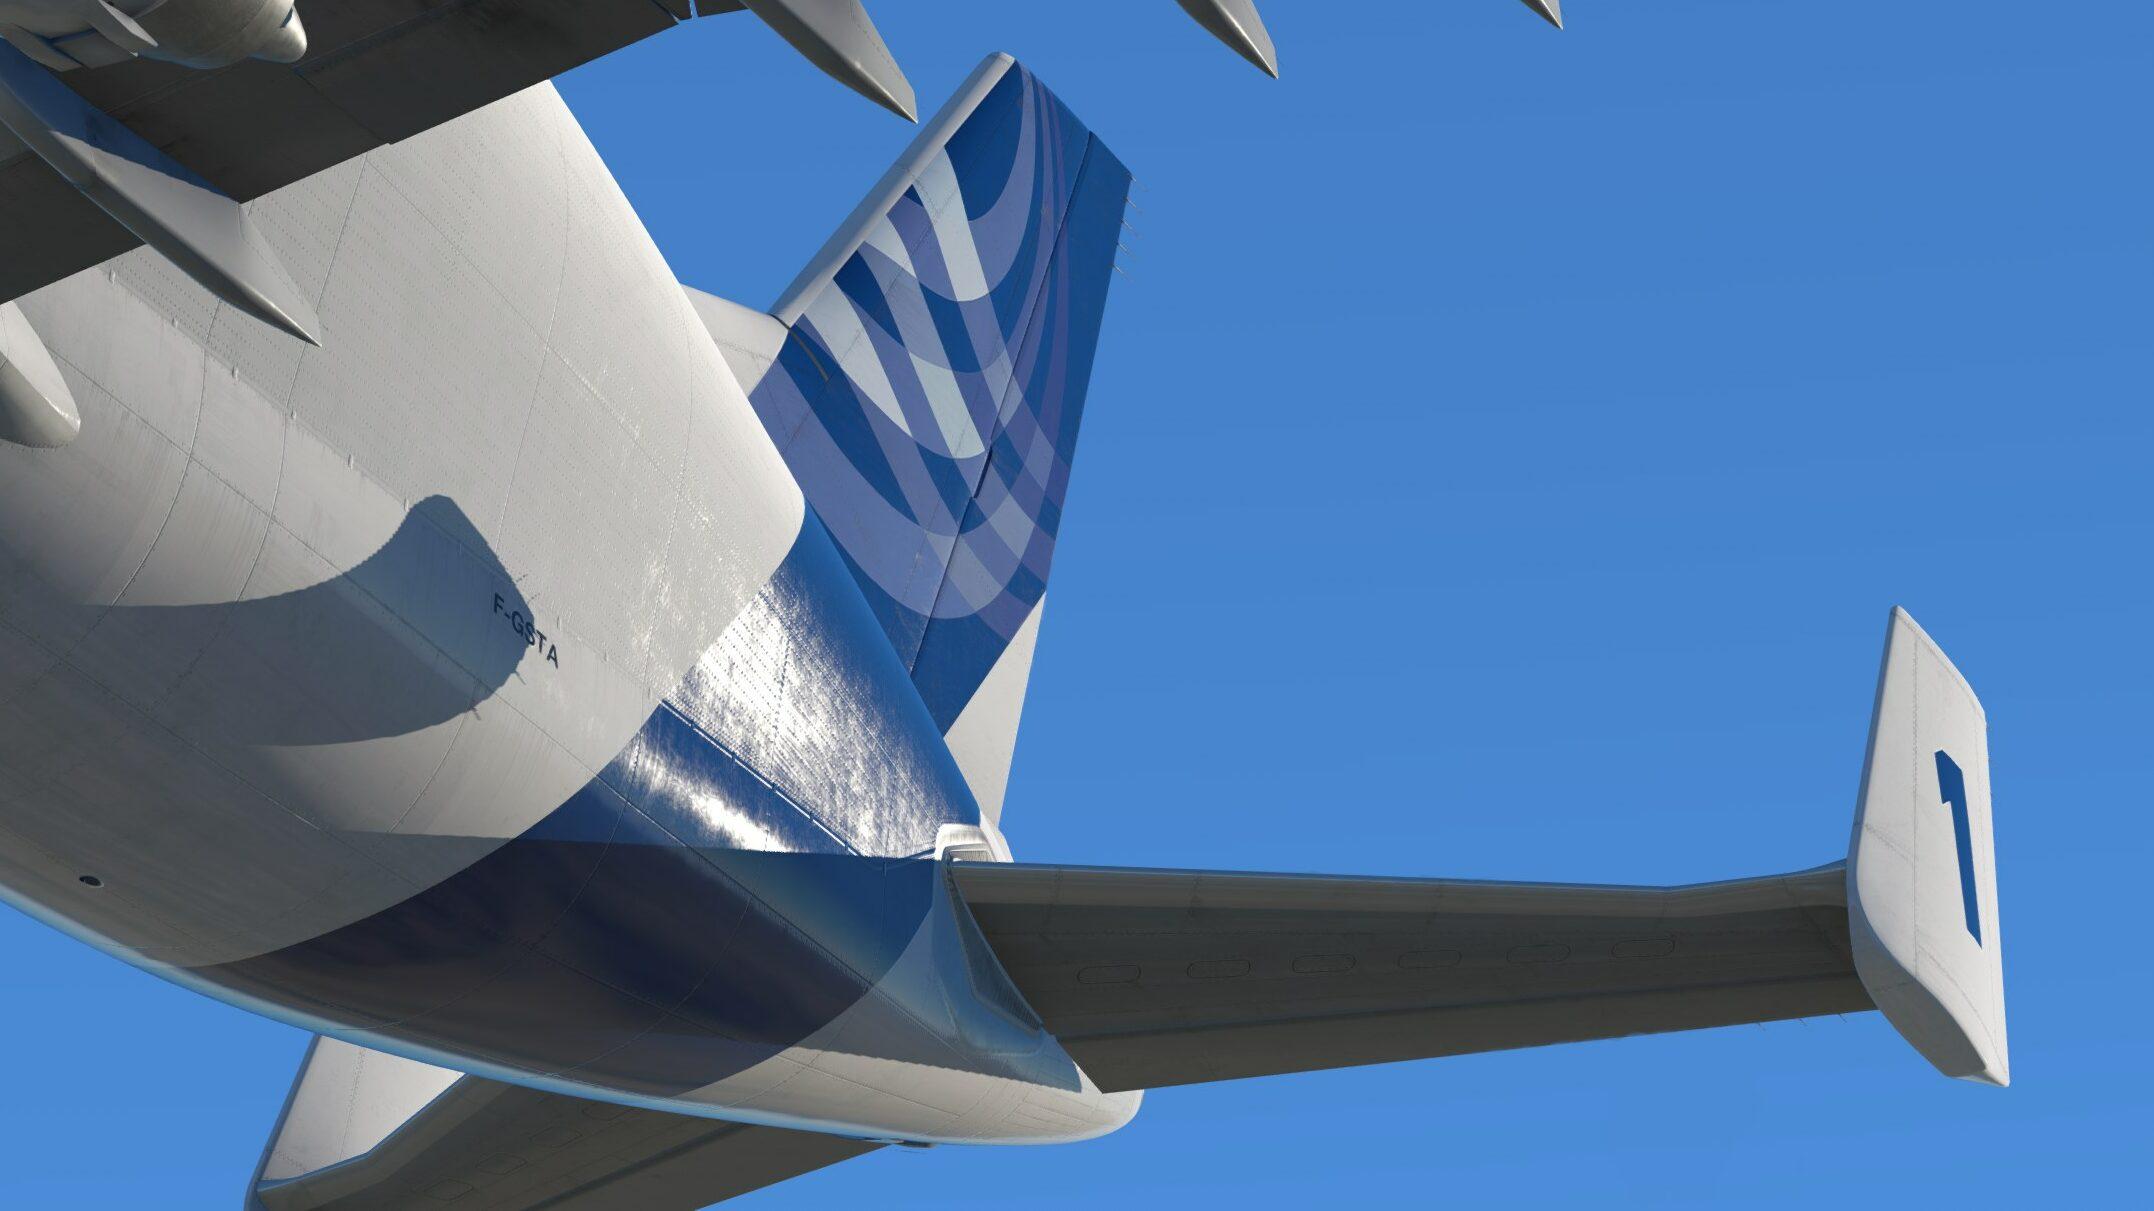 X-Plane_WfJivfQ2fS